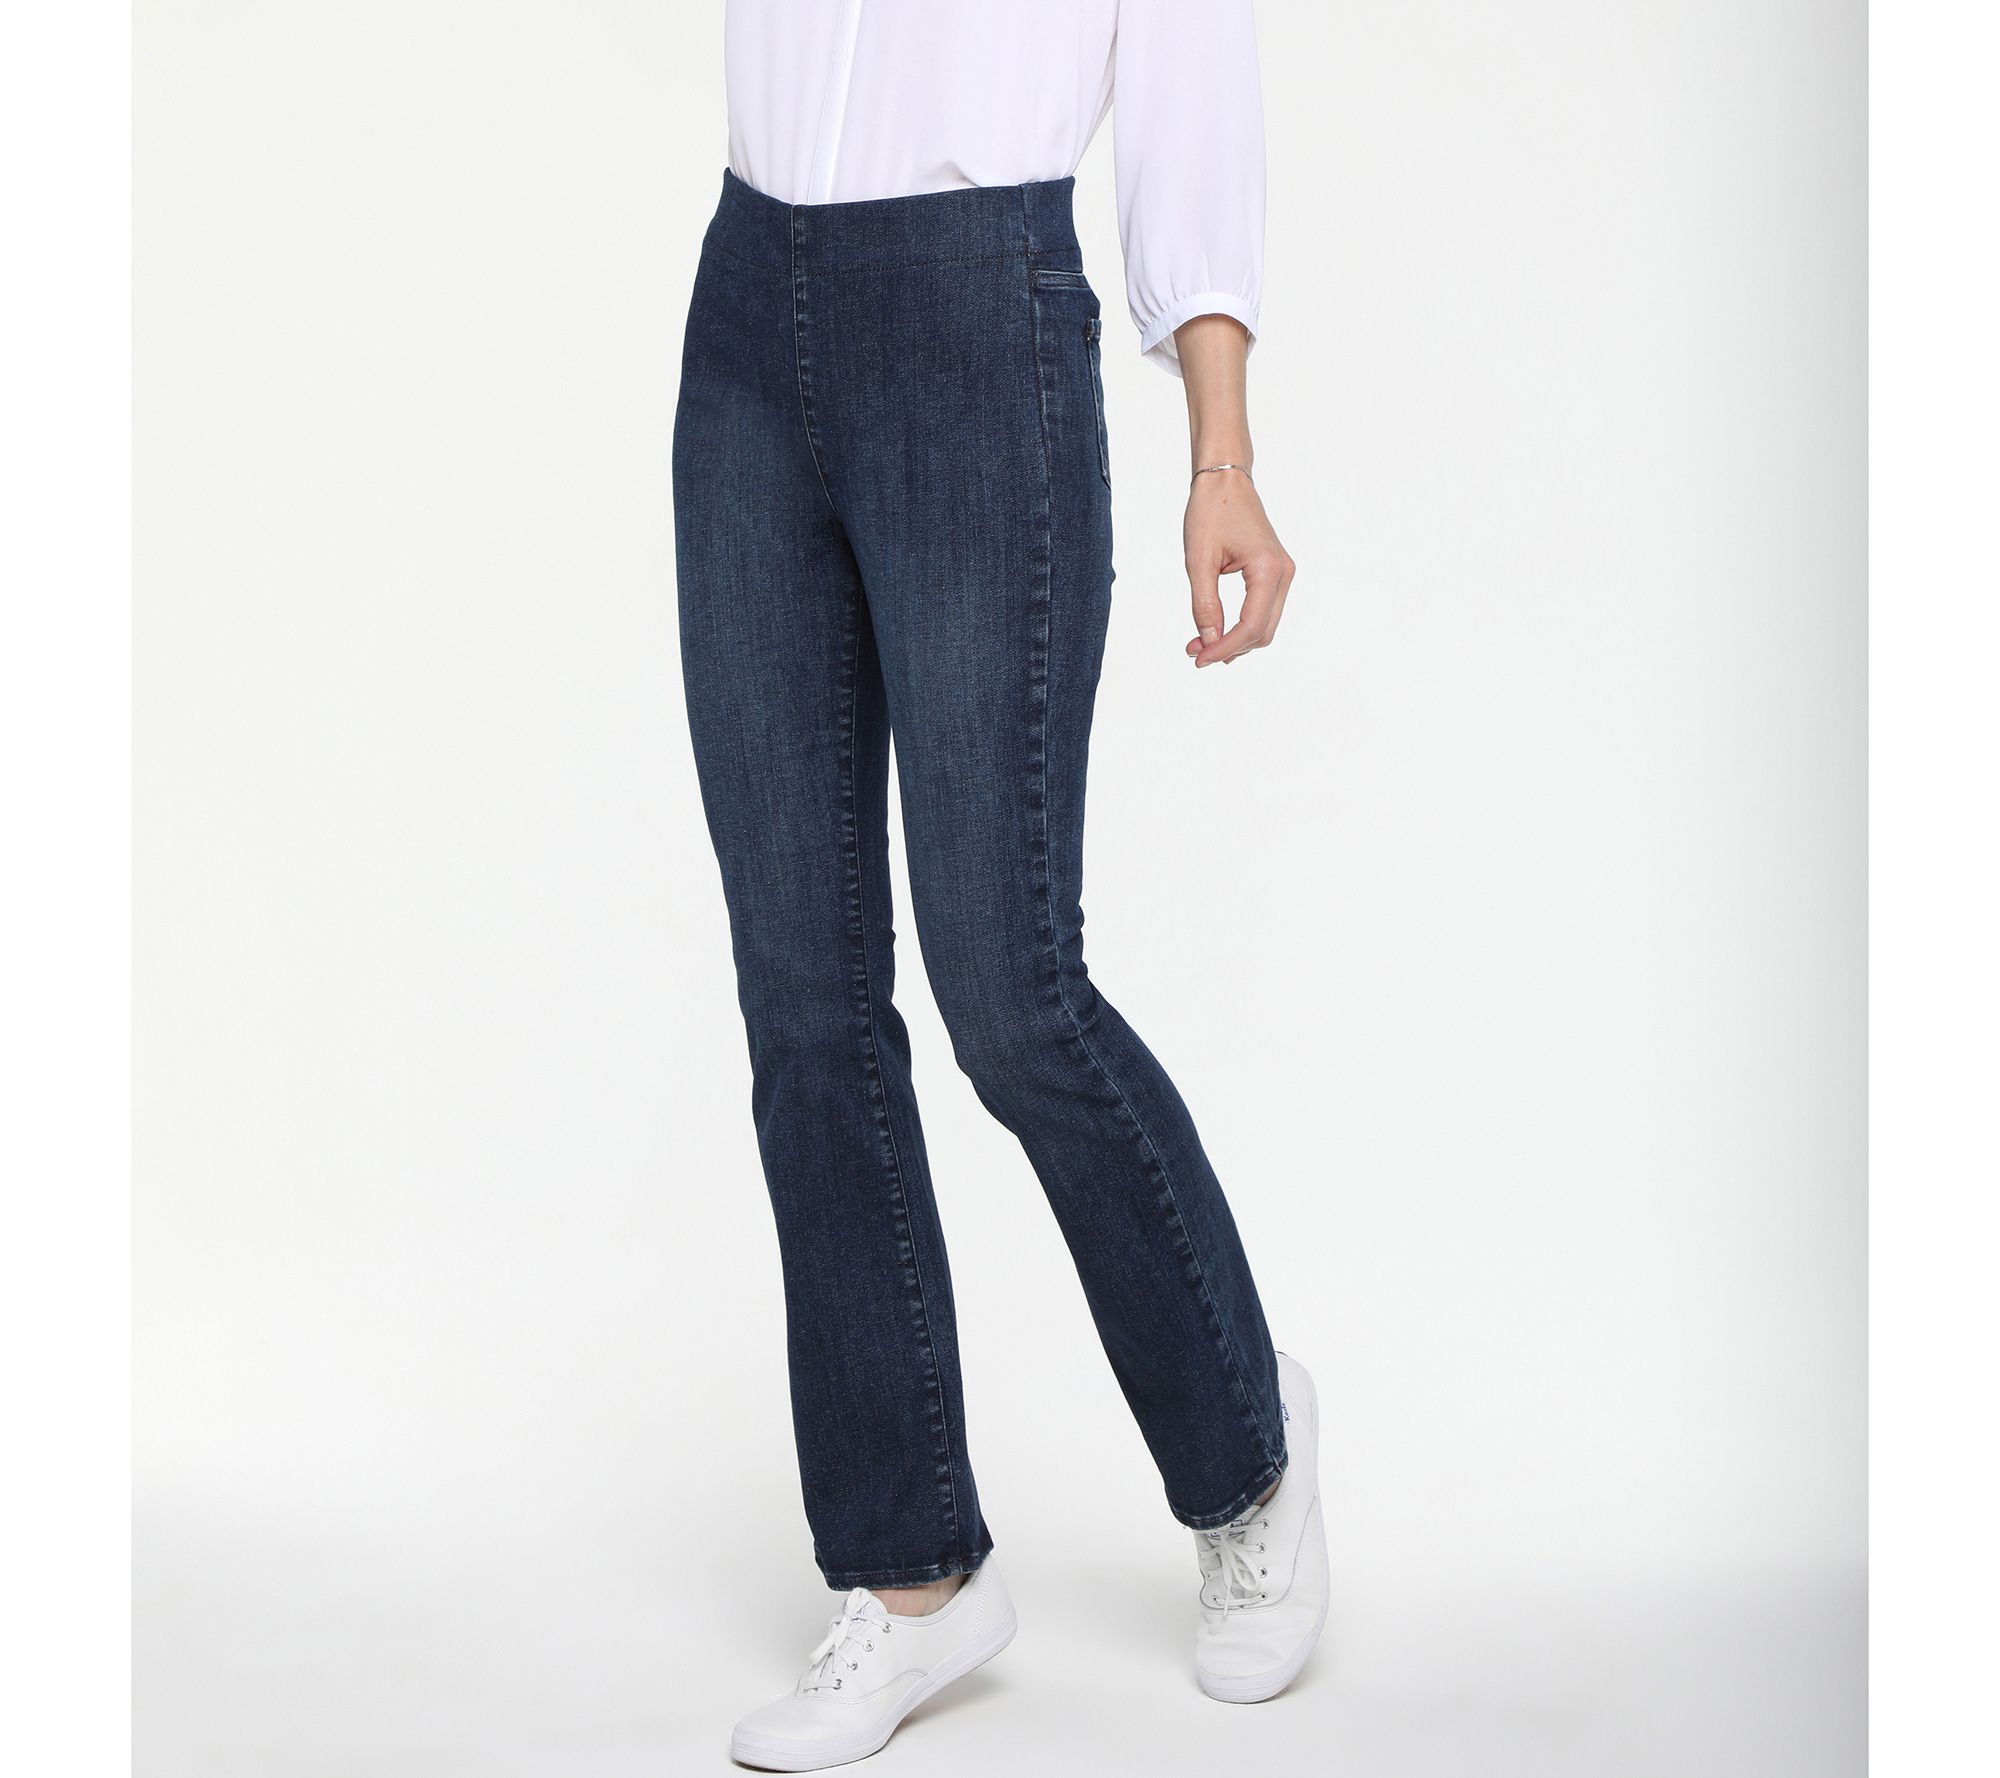 NYDJ Spanspring Pull-On Slim Bootcut Jeans- Decker